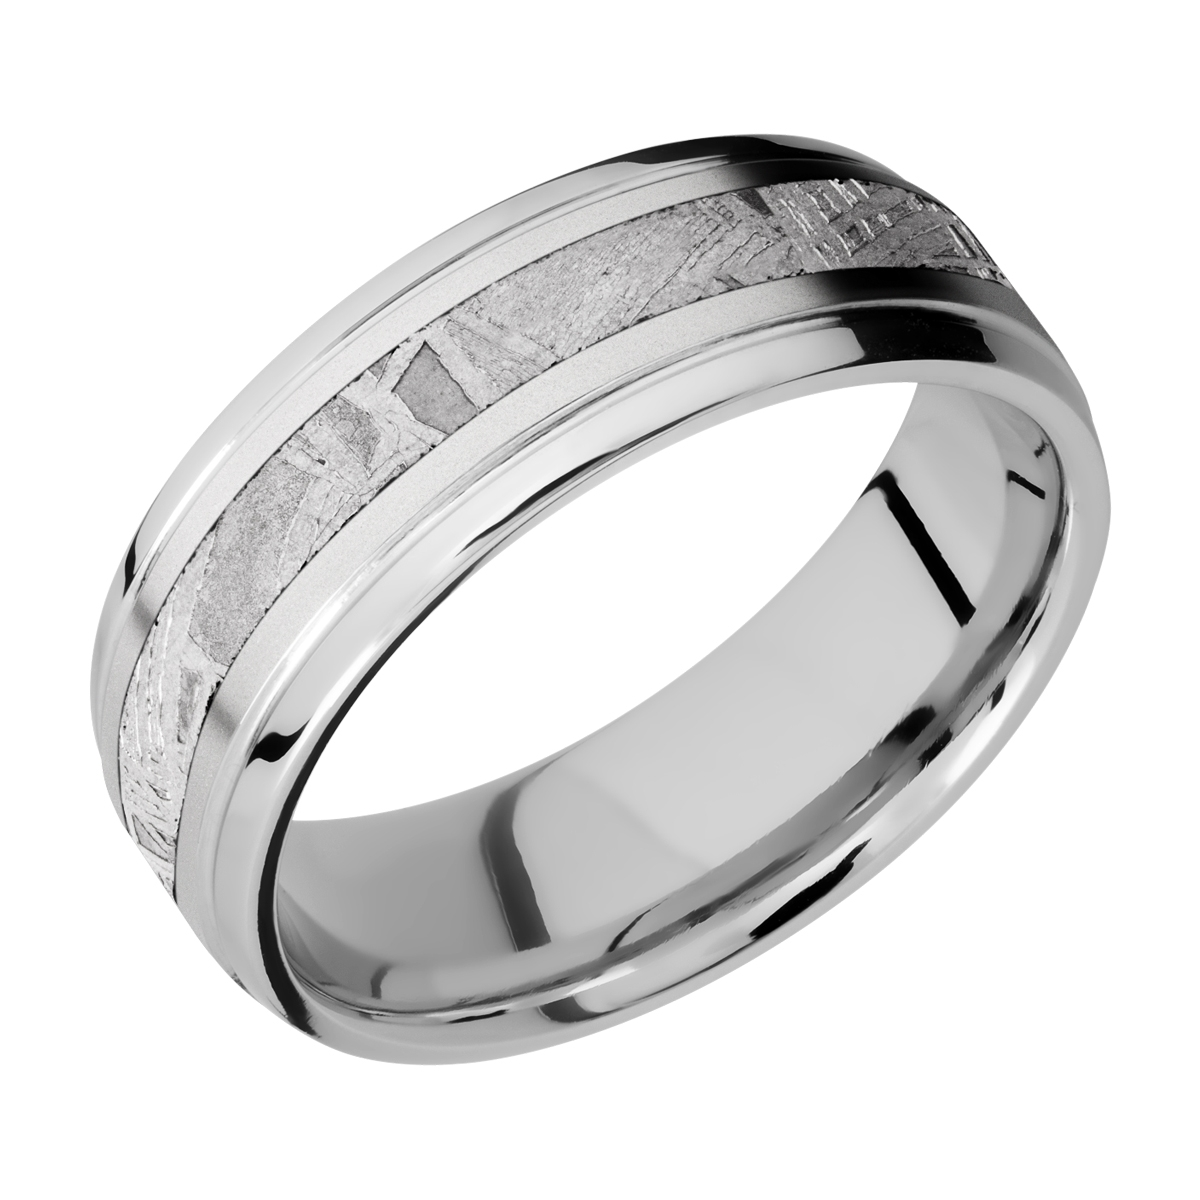 Lashbrook Cc7b13 Ns Meteorite Cobalt Chrome Wedding Ring Or Band